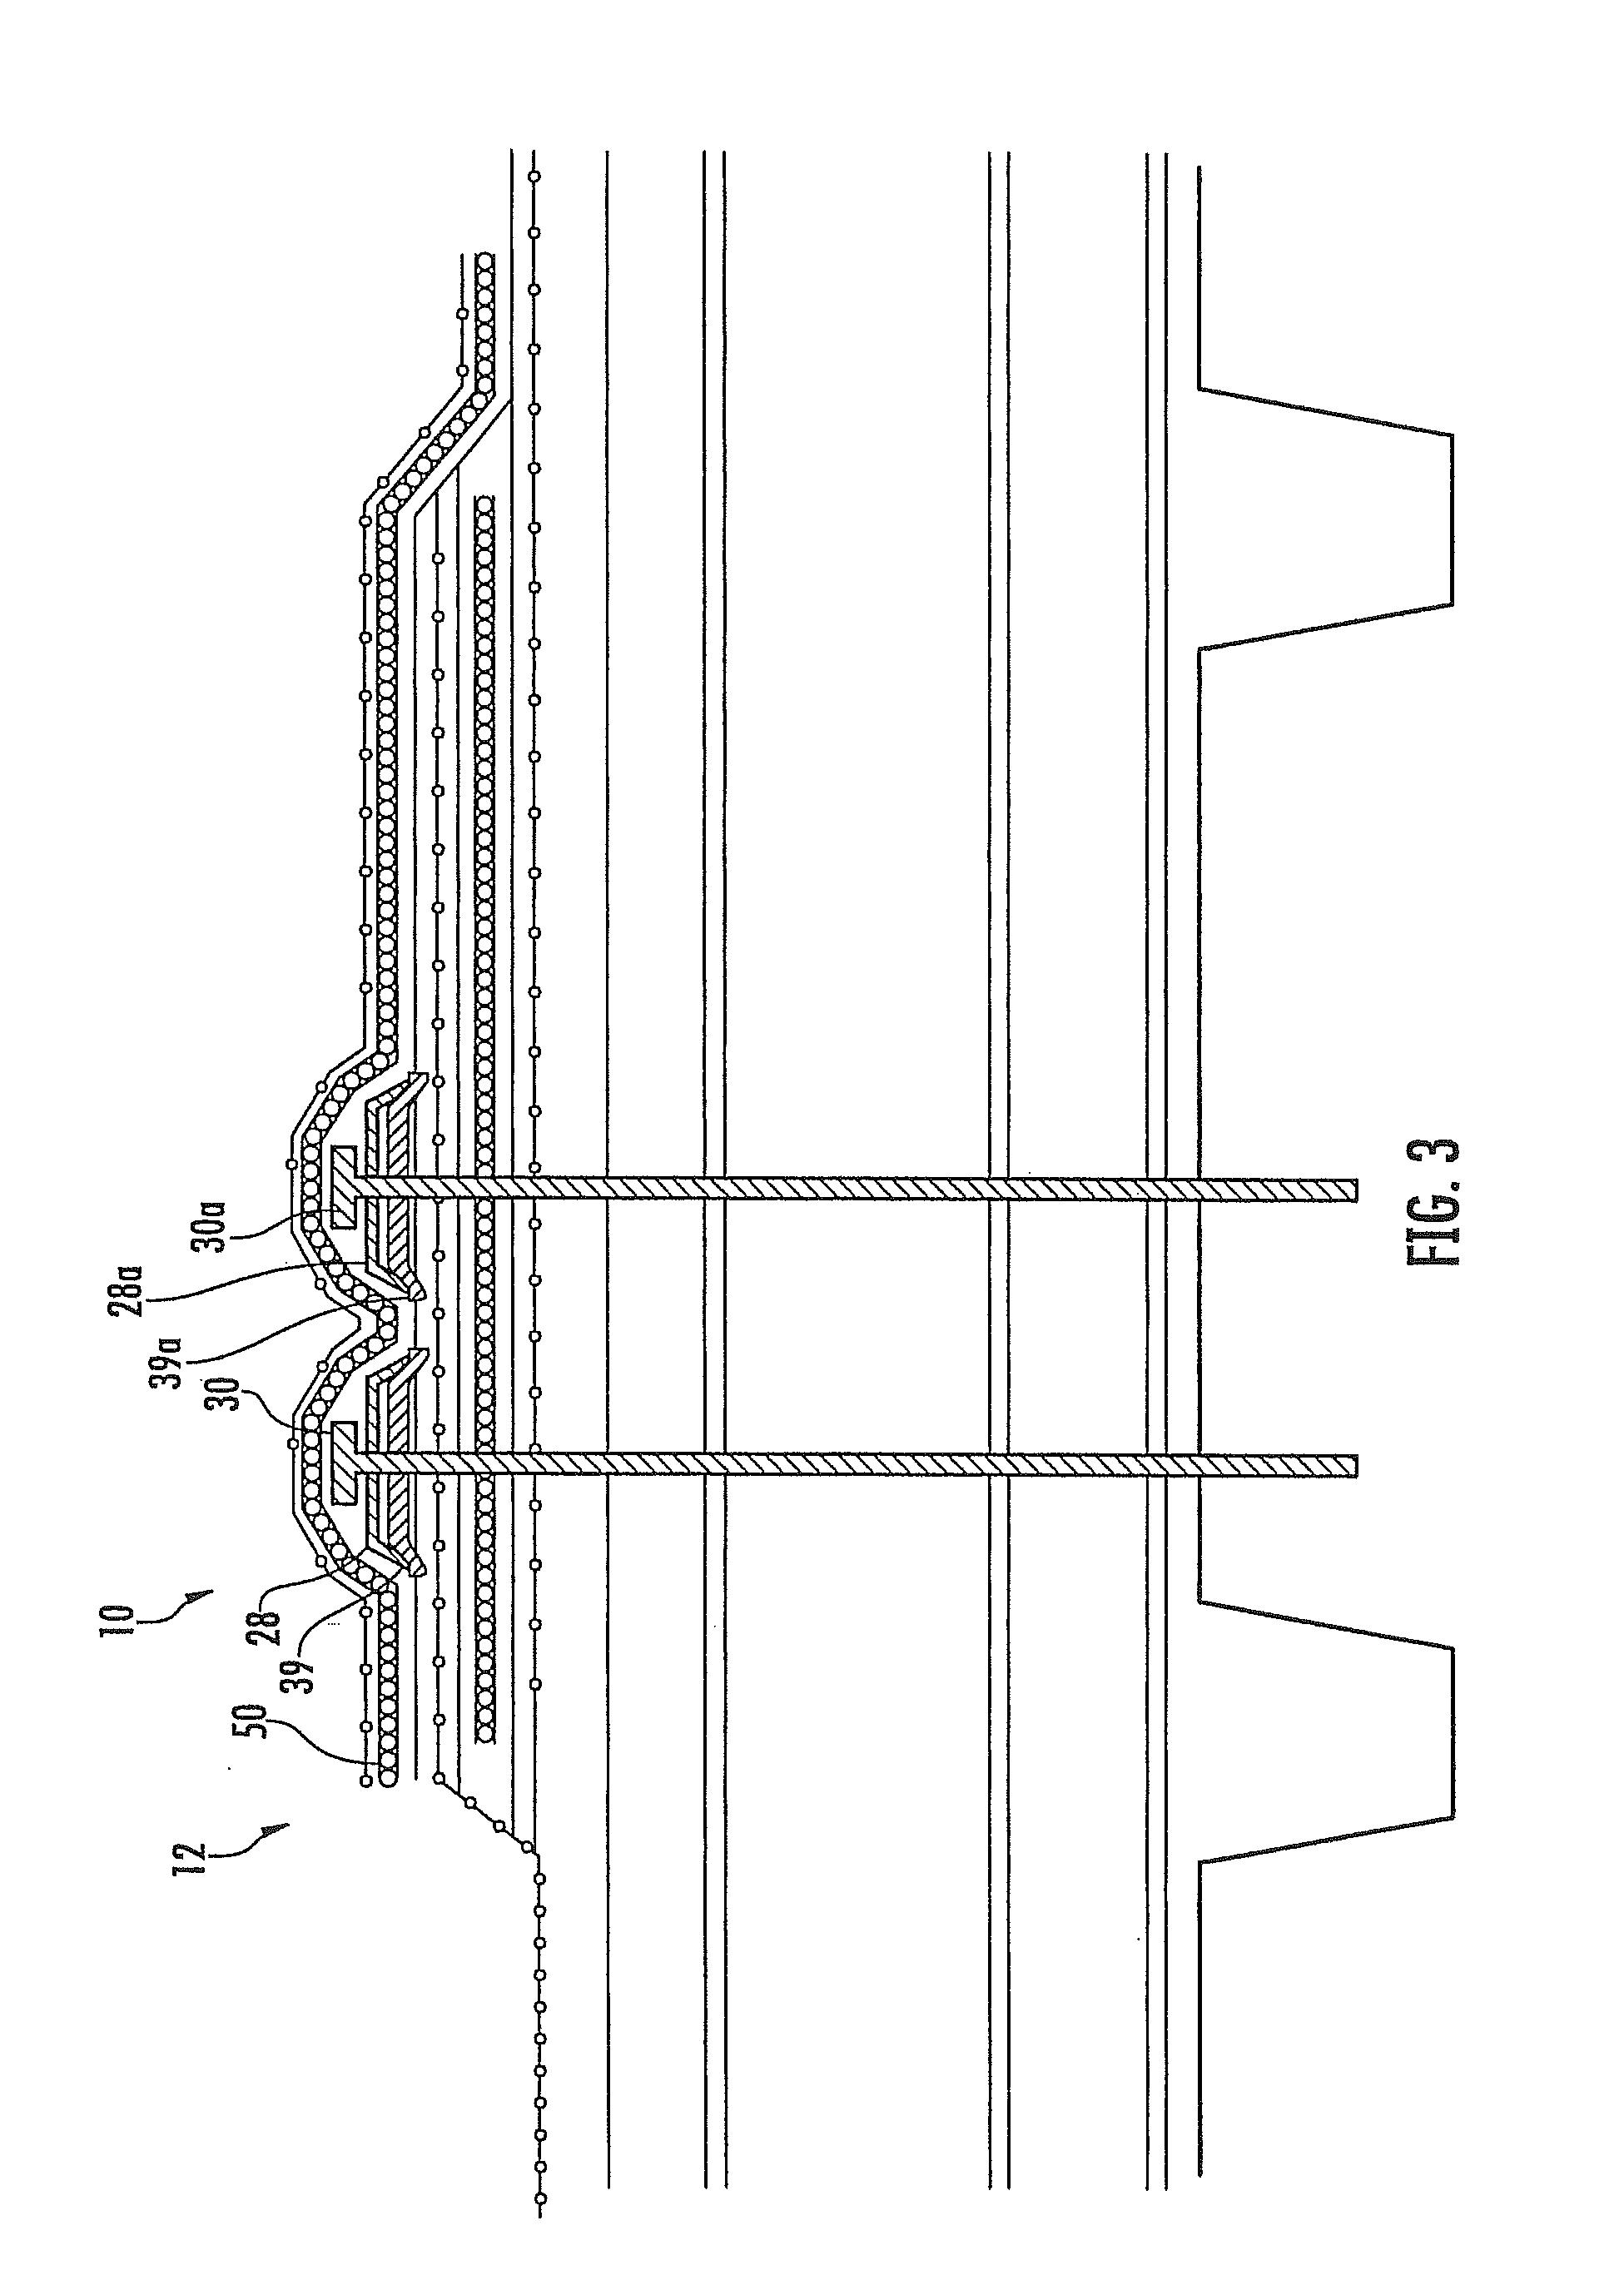 Interesting Nutone Intercom Wiring-diagram Ideas - Best Image Wiring .